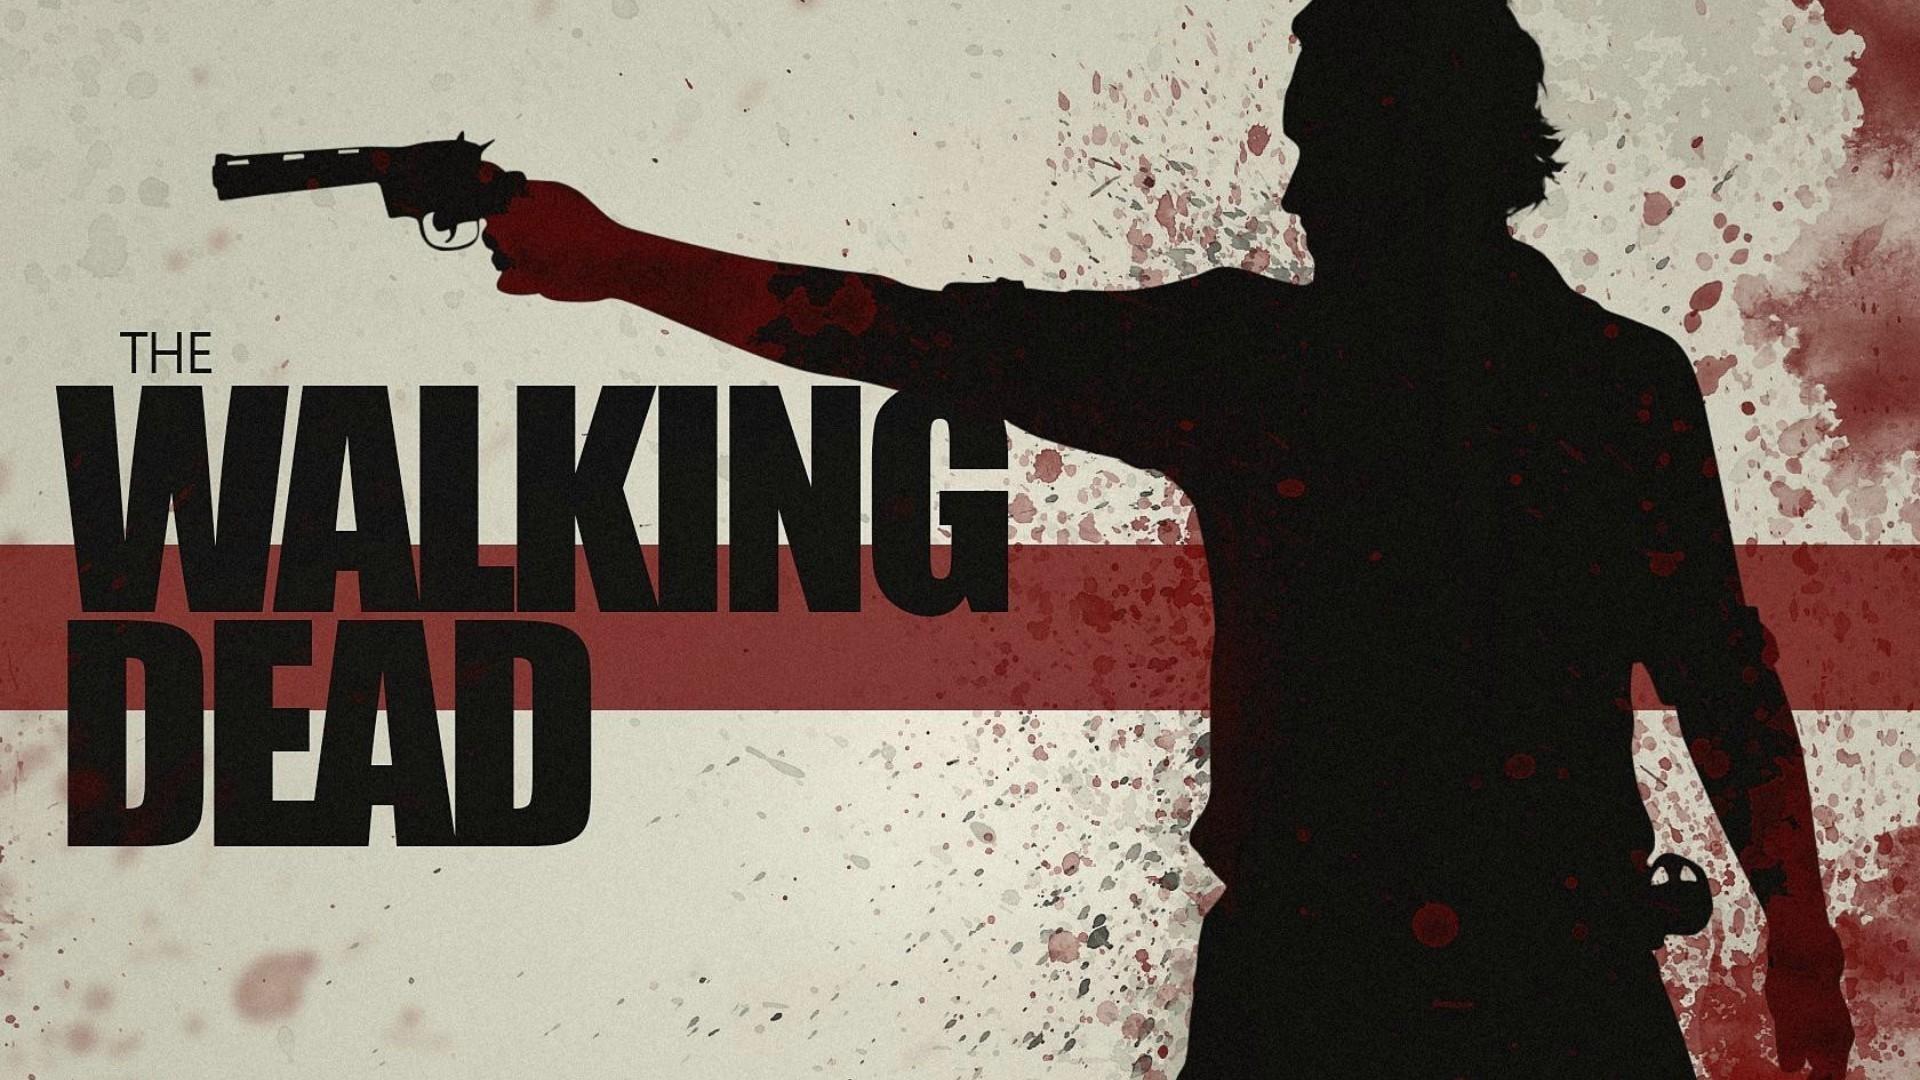 The Walking Dead Wallpaper 1920x1080 Wallpapertag